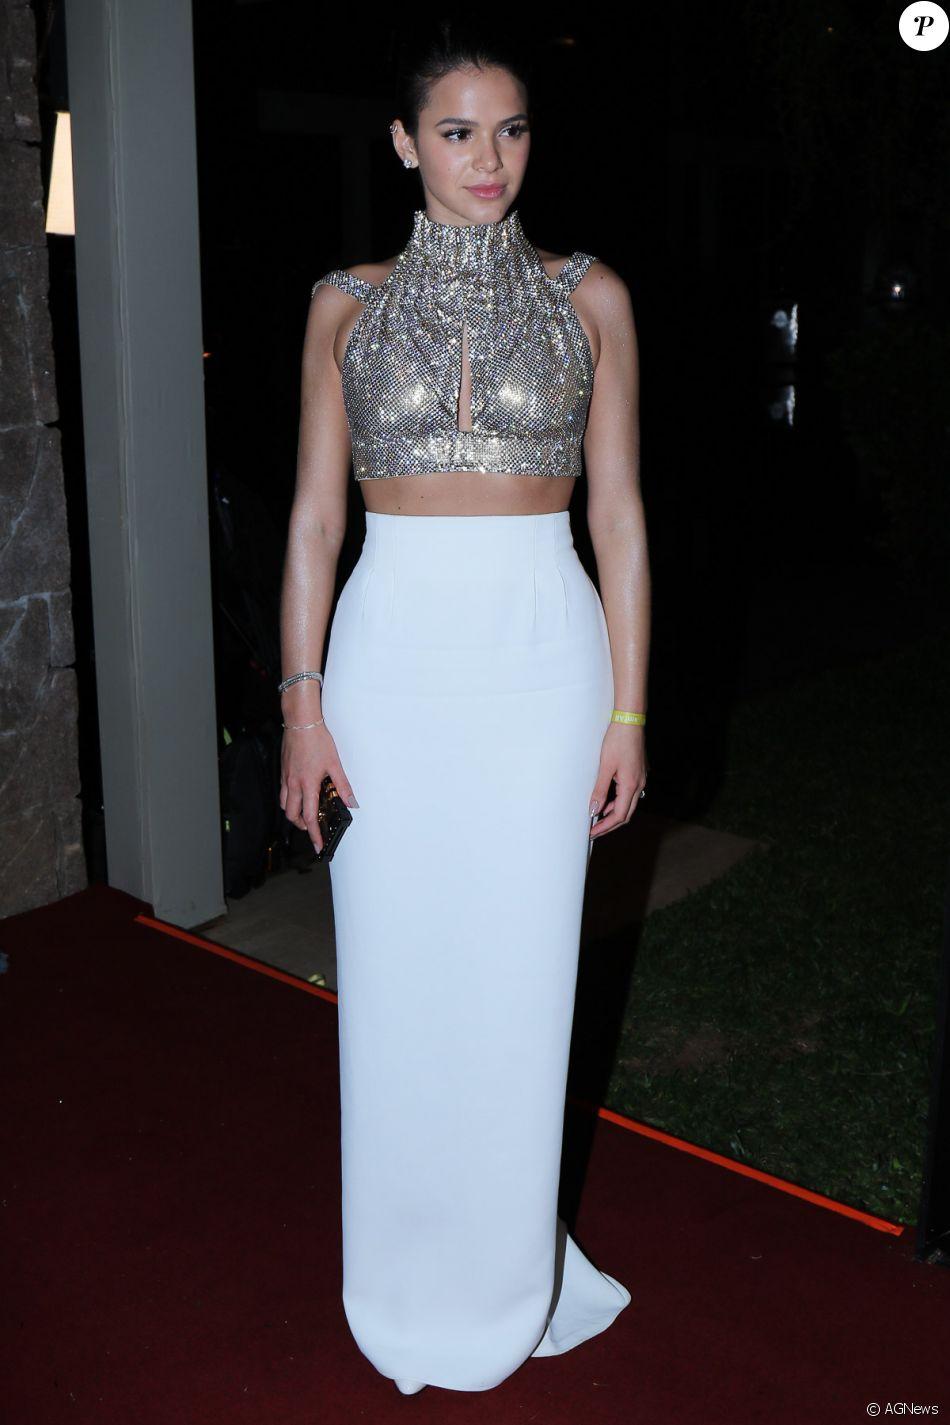 Bruna Marquezine visita igreja e posa com fãs em Nova York ... Jennifer Aniston Brad Pitt